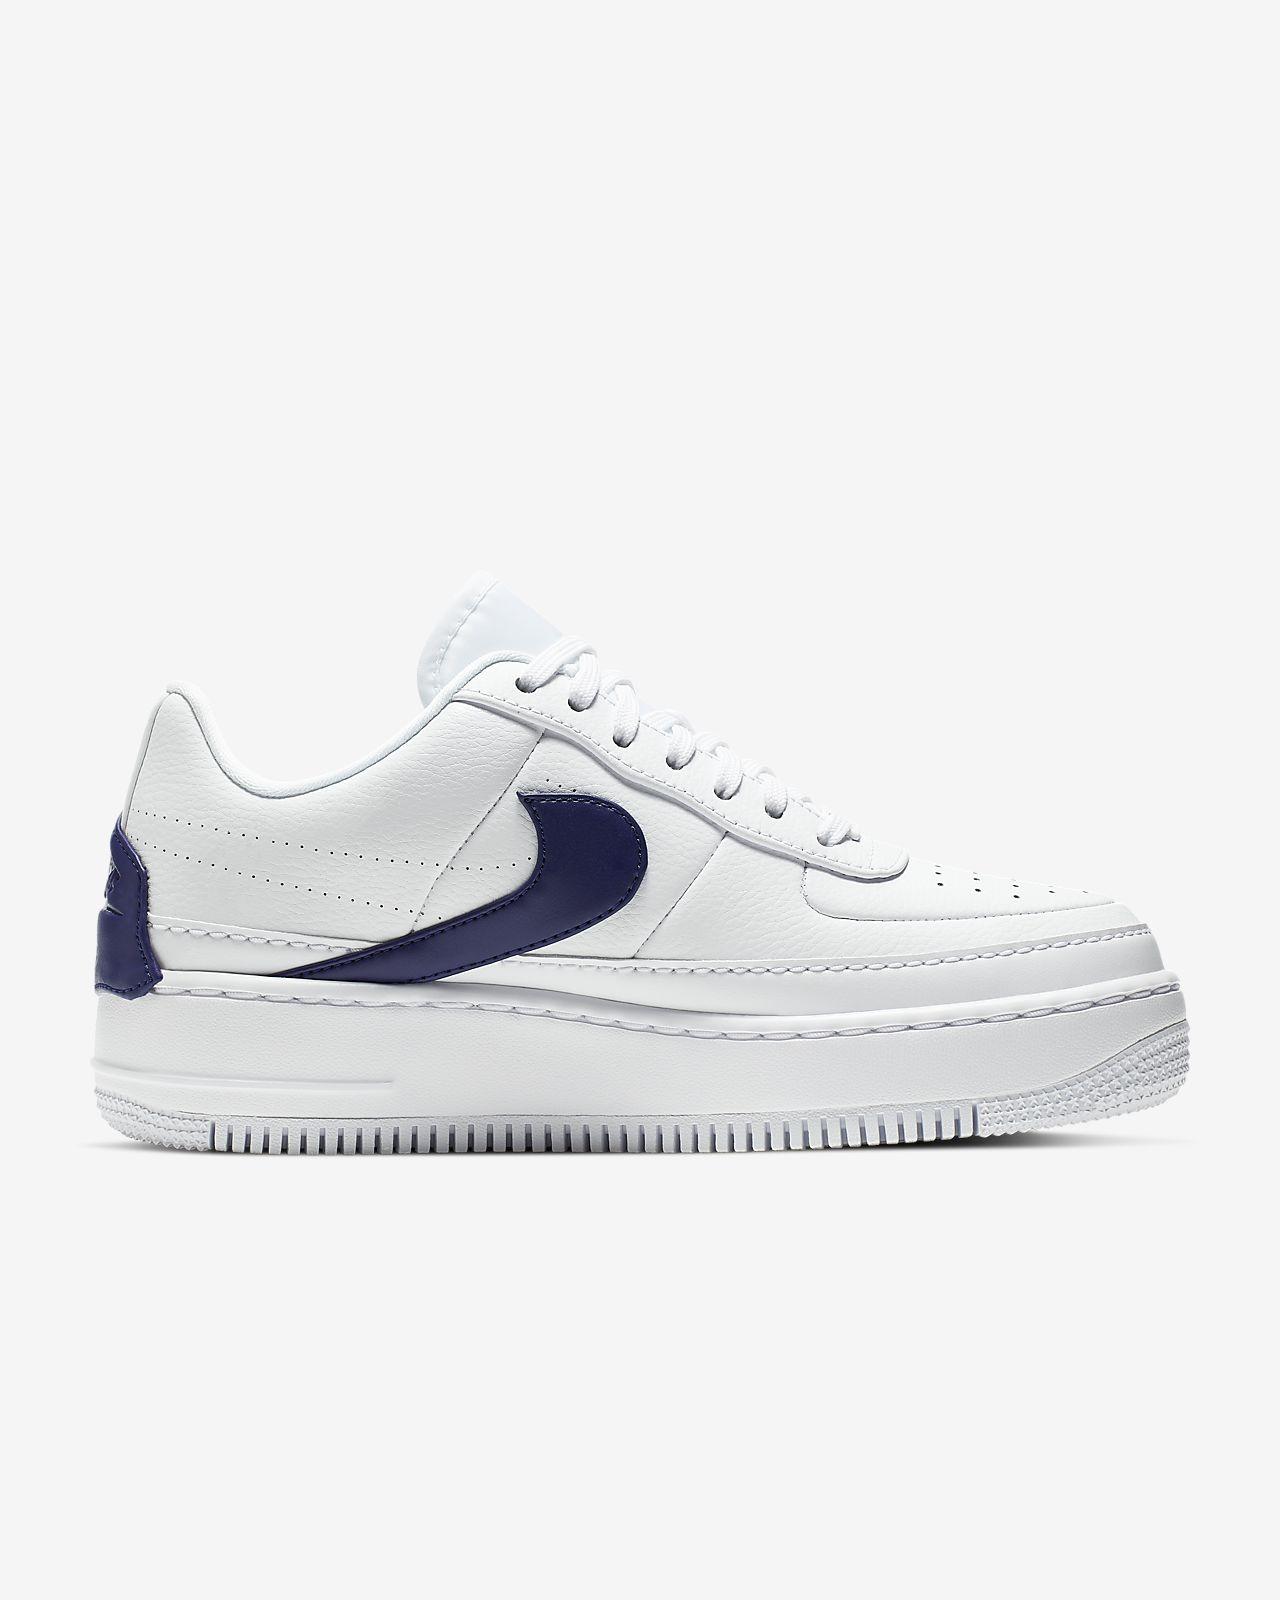 248096dd184 Chaussure 1 XxCa Jester Nike Air Force USVpGqzM